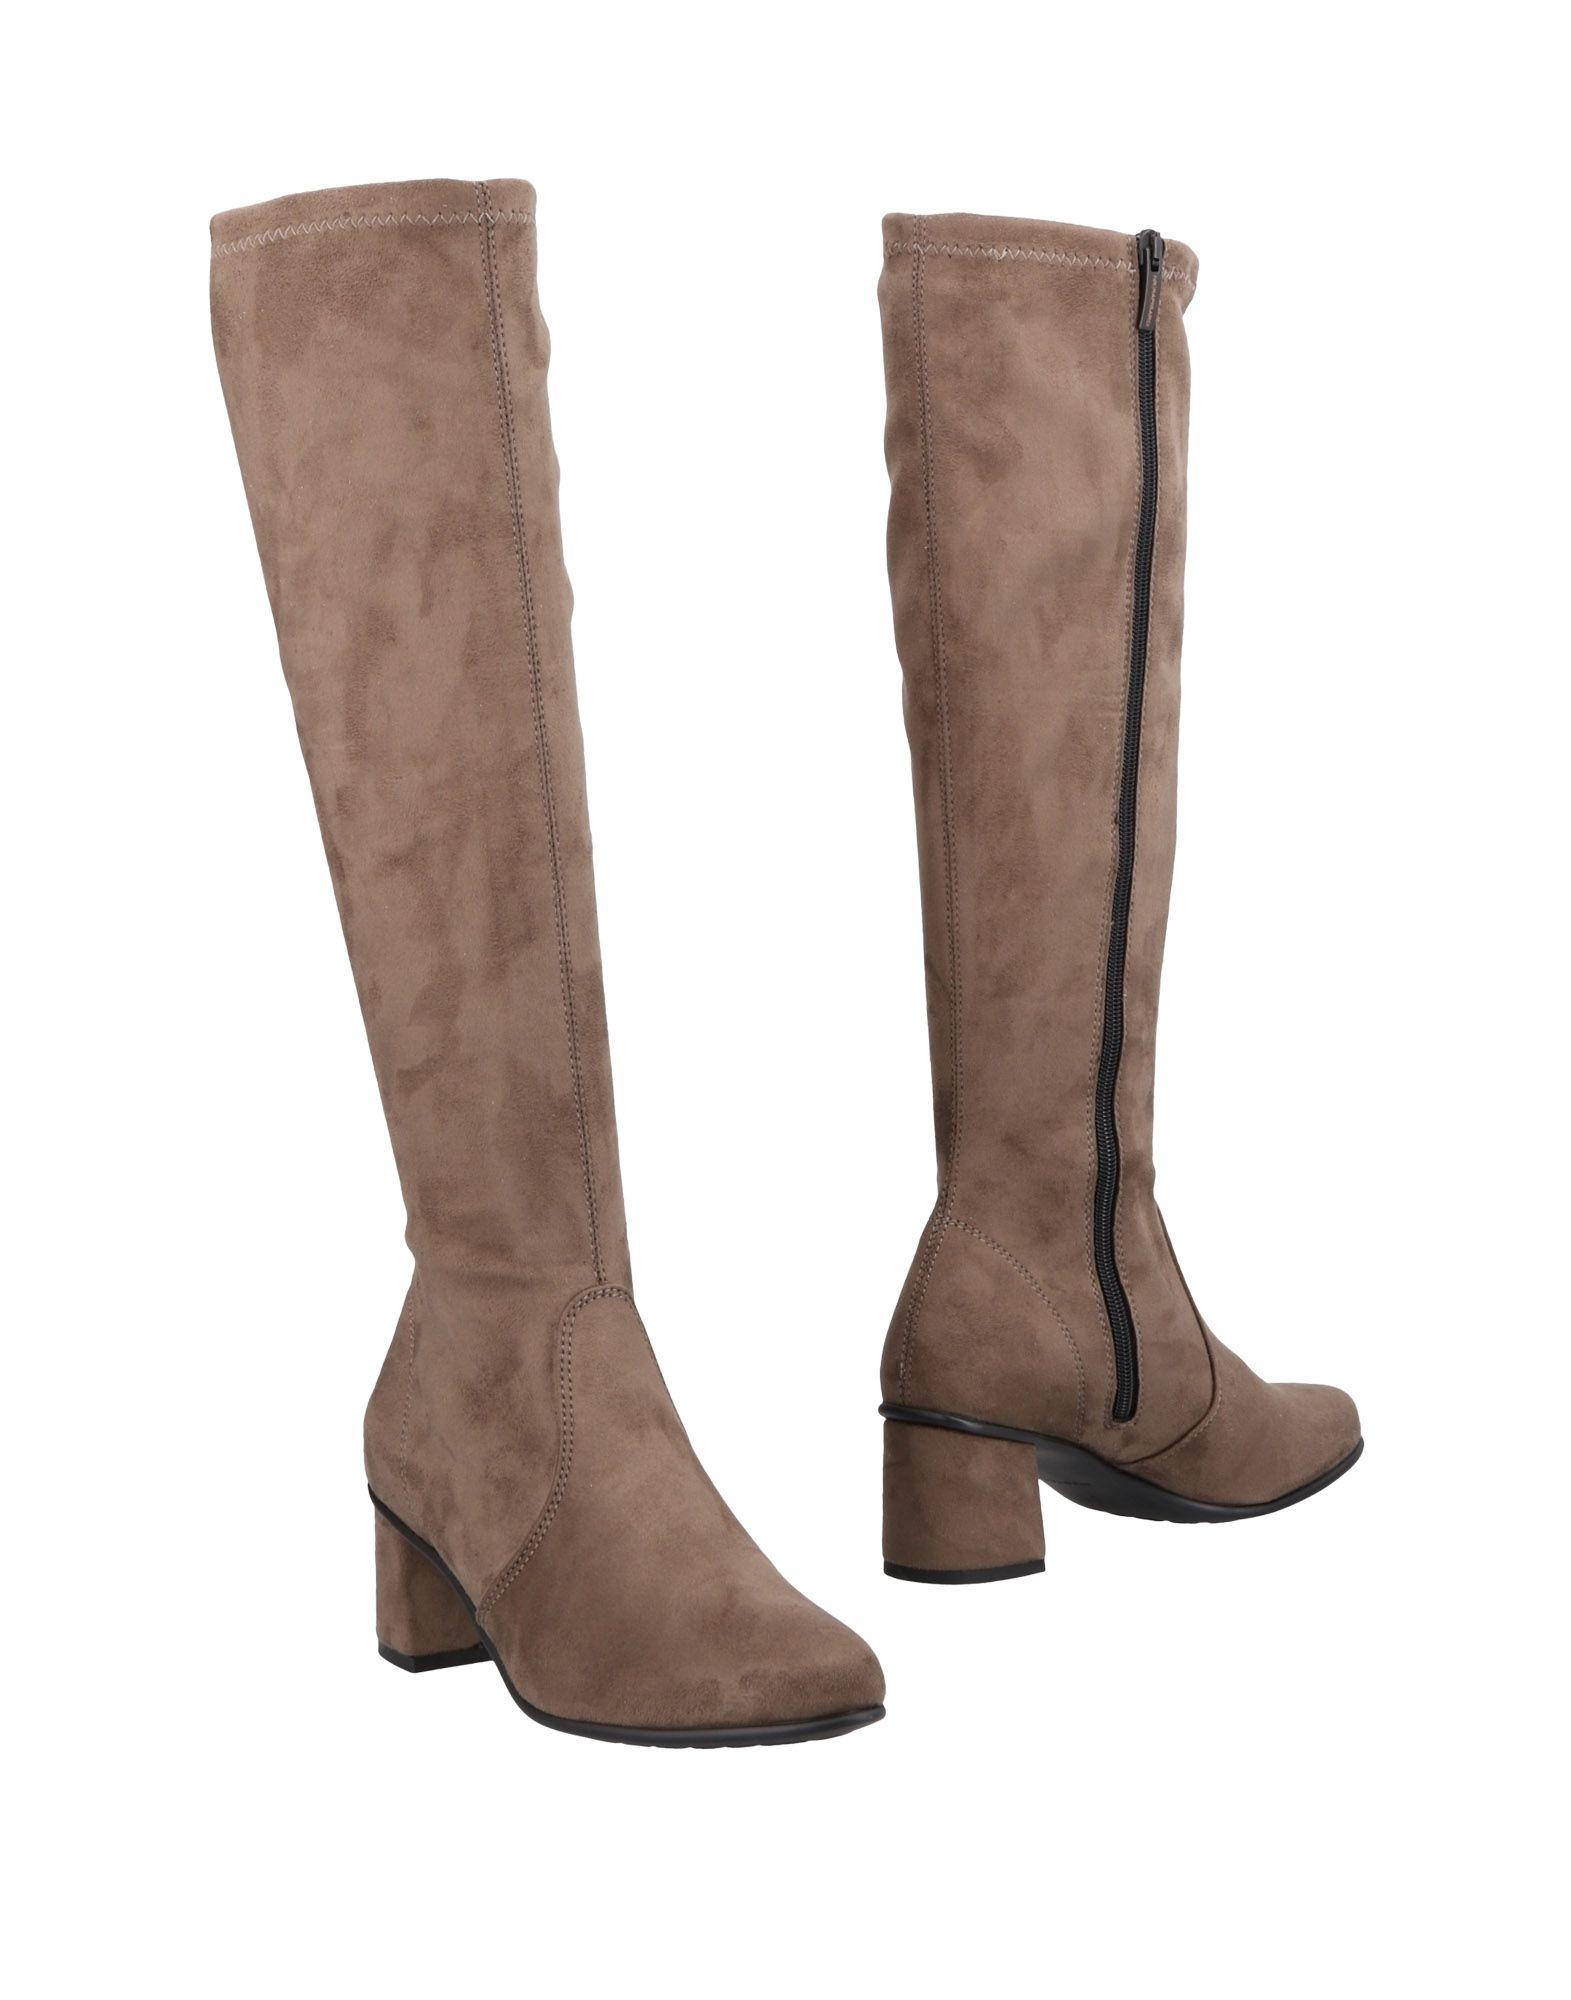 Nr Rapisardi Stiefel Schuhe Damen  11473016WJ Gute Qualität beliebte Schuhe Stiefel 2484a5